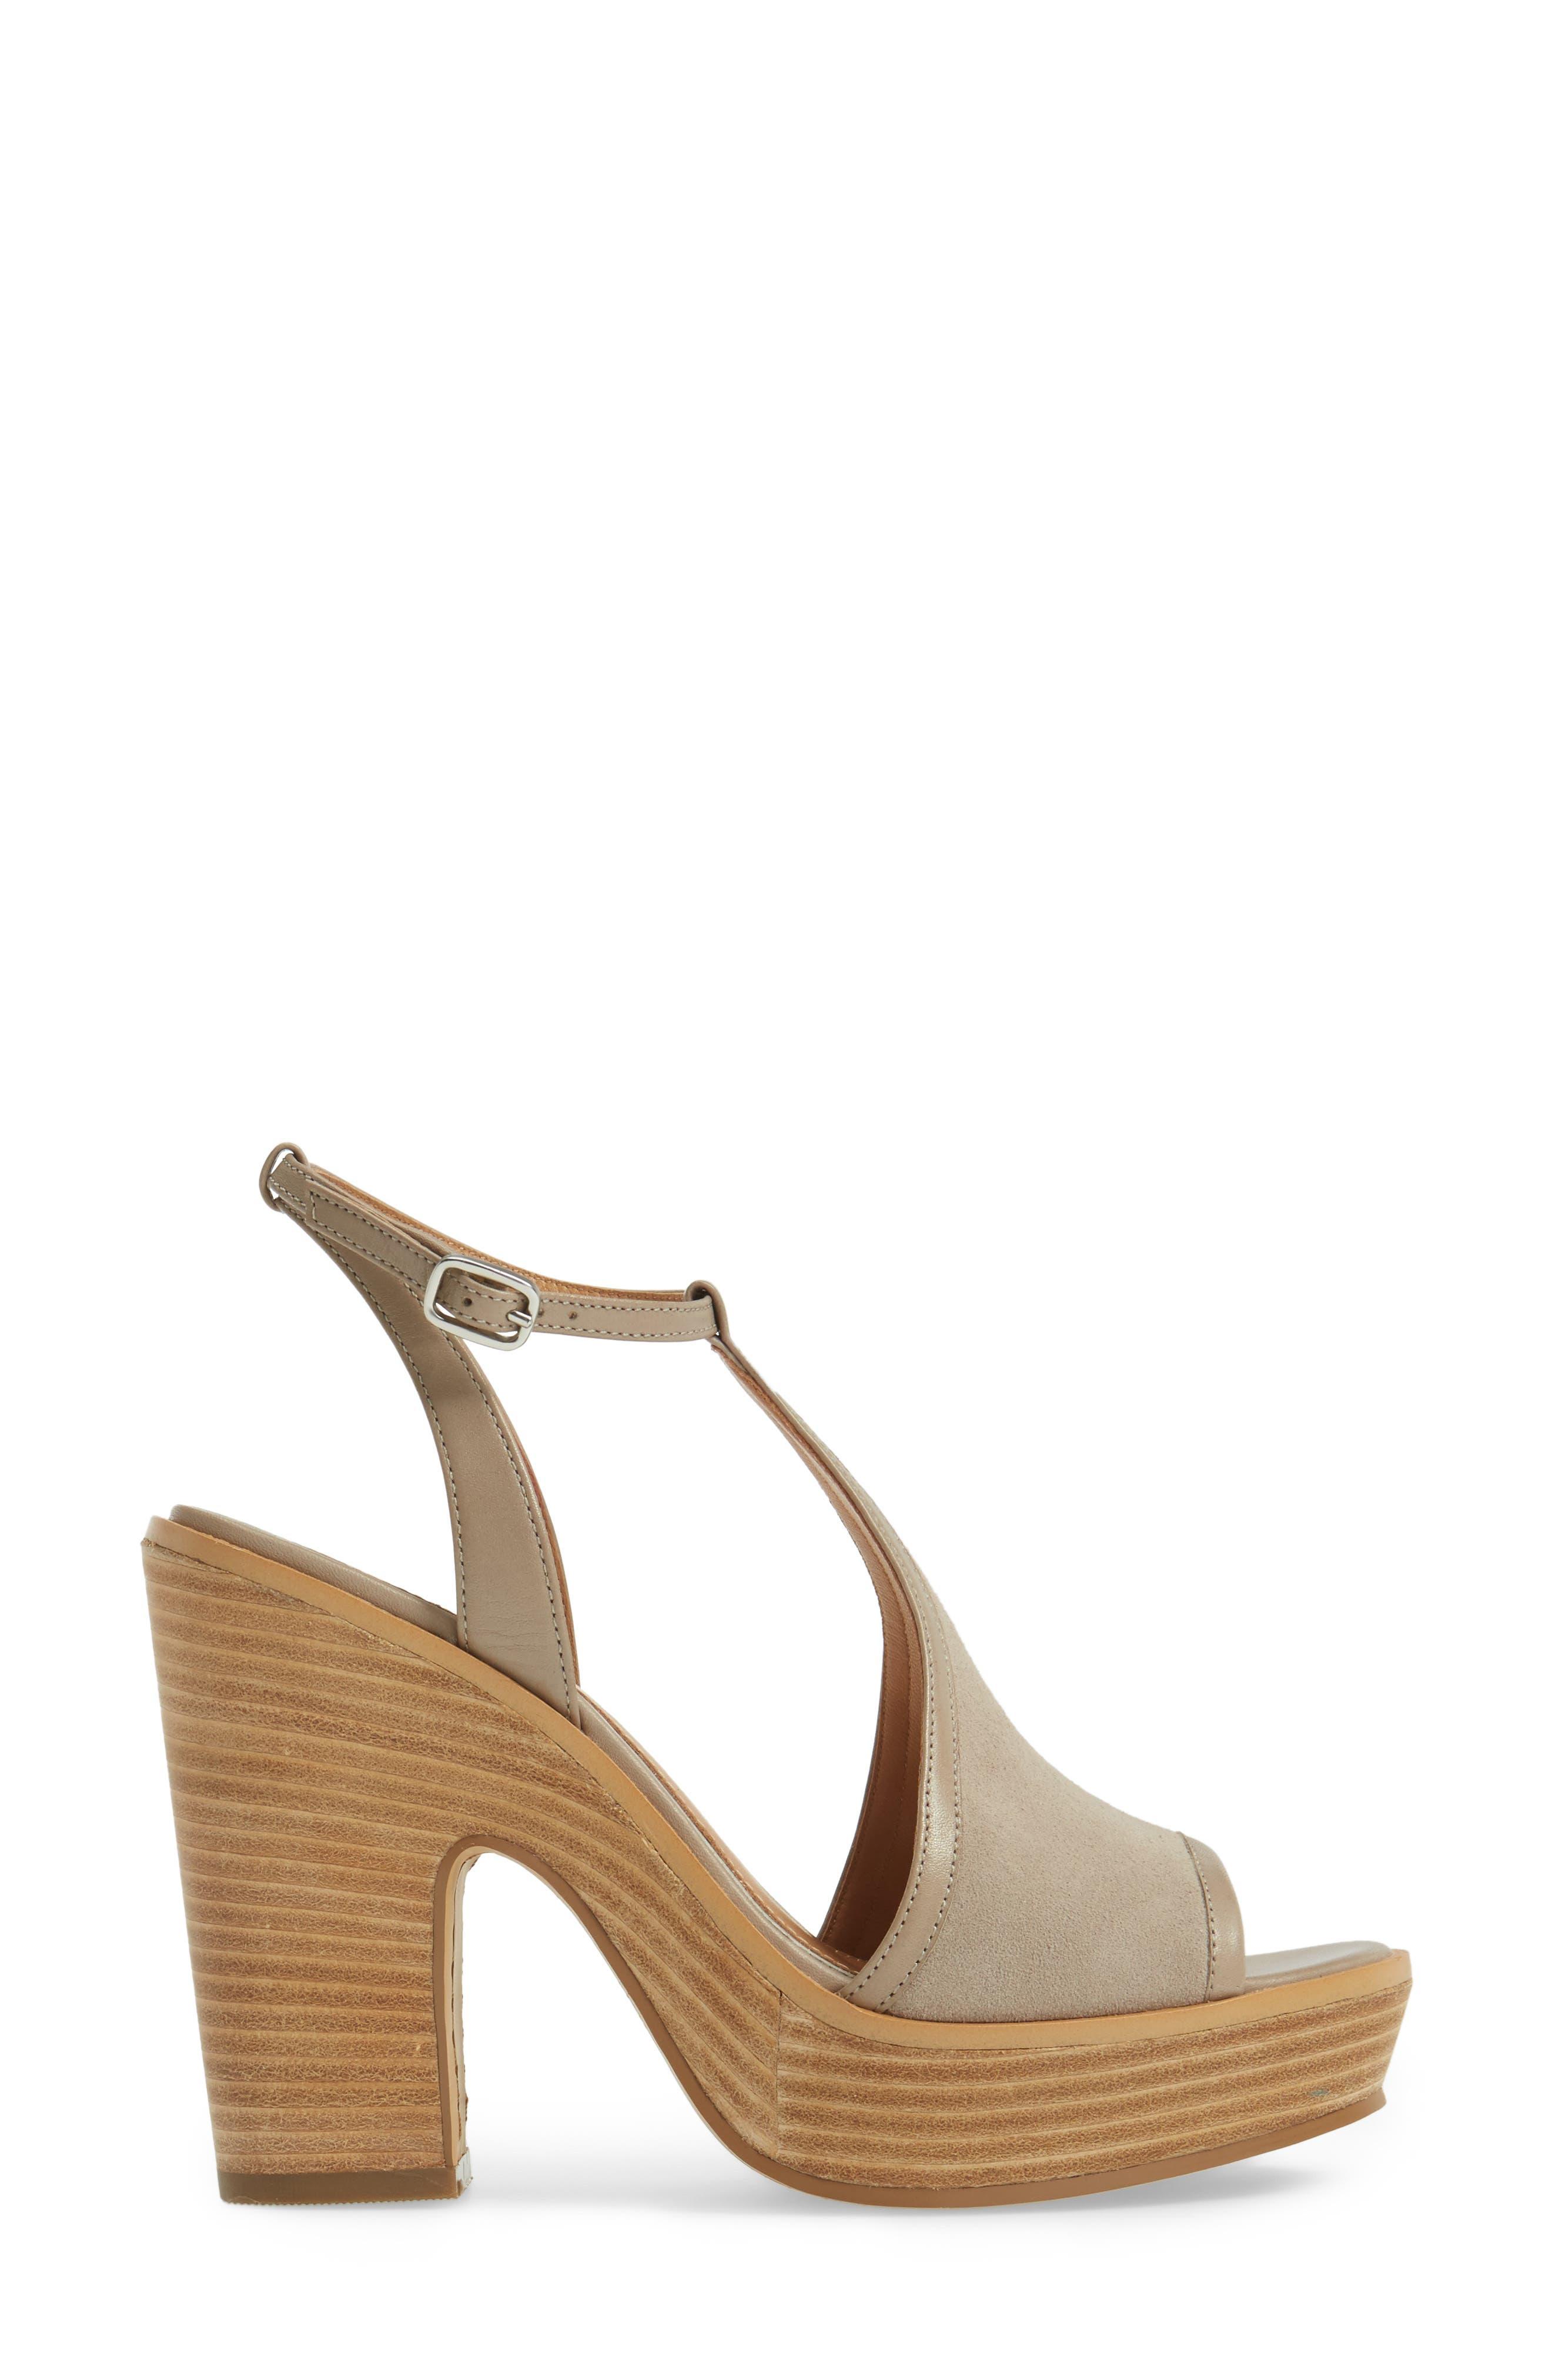 India T-Strap Platform Sandal,                             Alternate thumbnail 3, color,                             Rock Suede